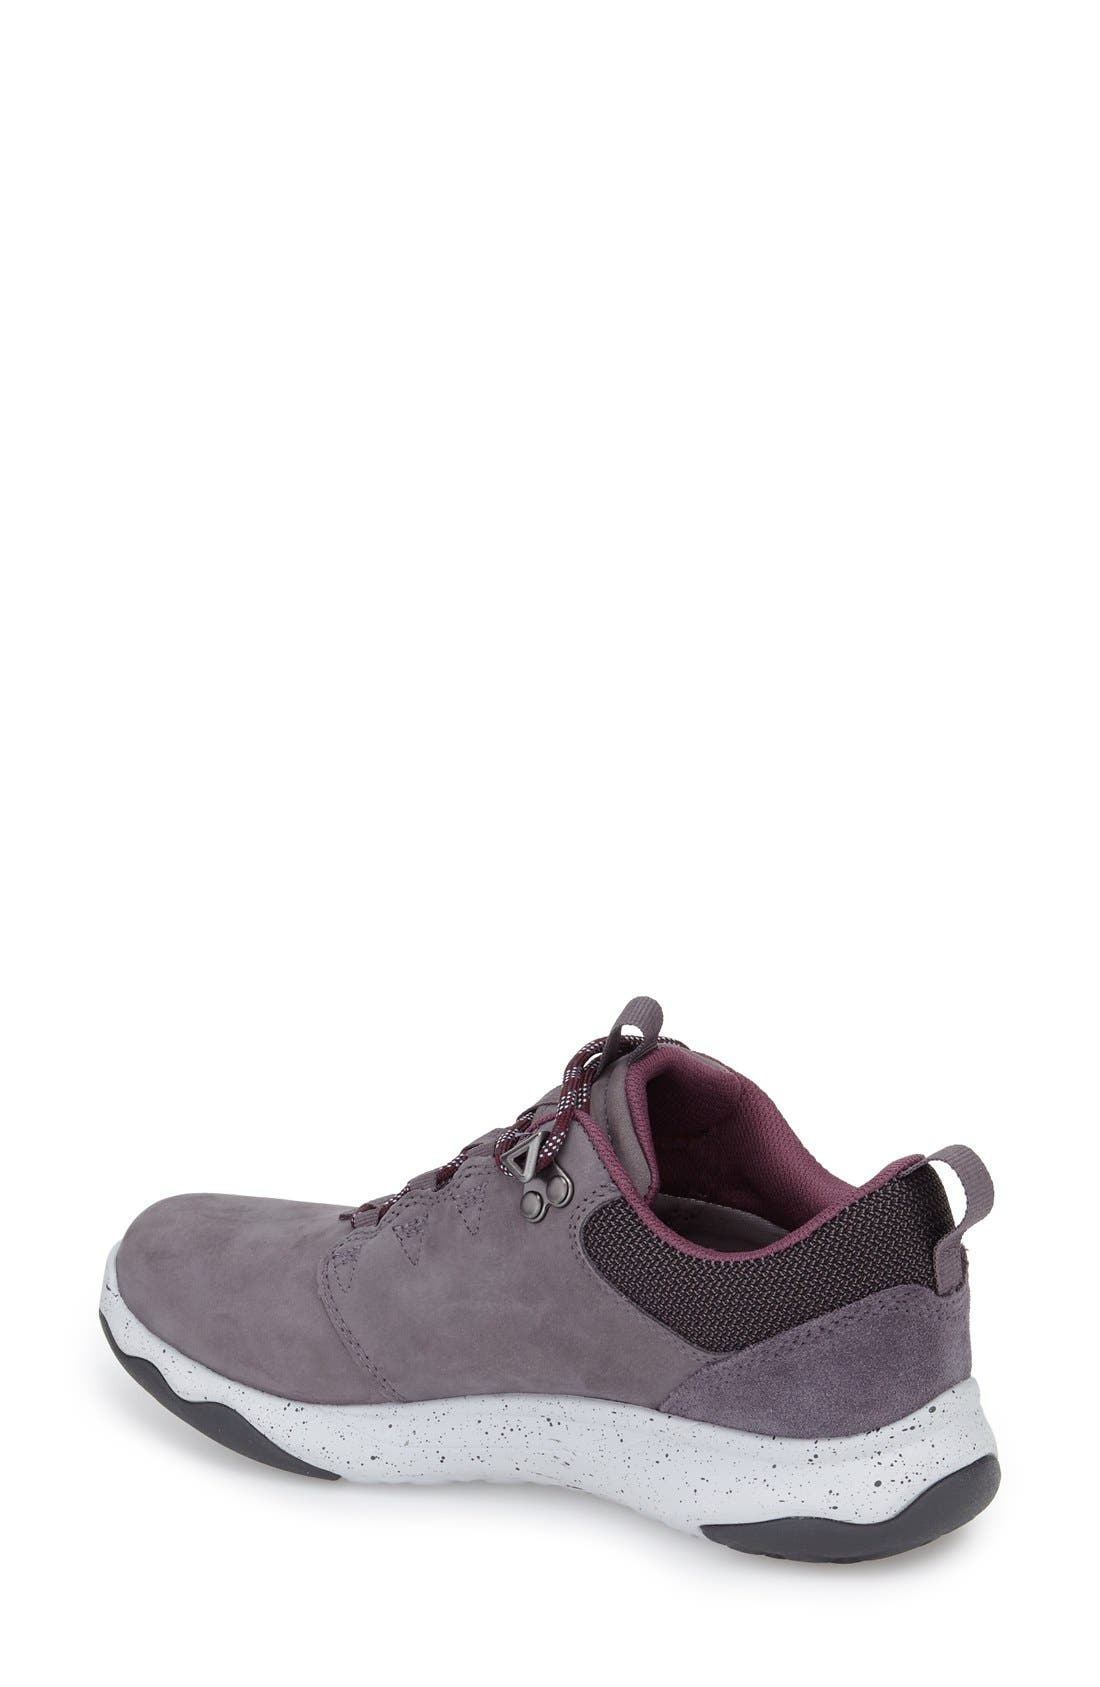 Alternate Image 2  - Teva 'Arrowood Lux' Waterproof Sneaker (Women)